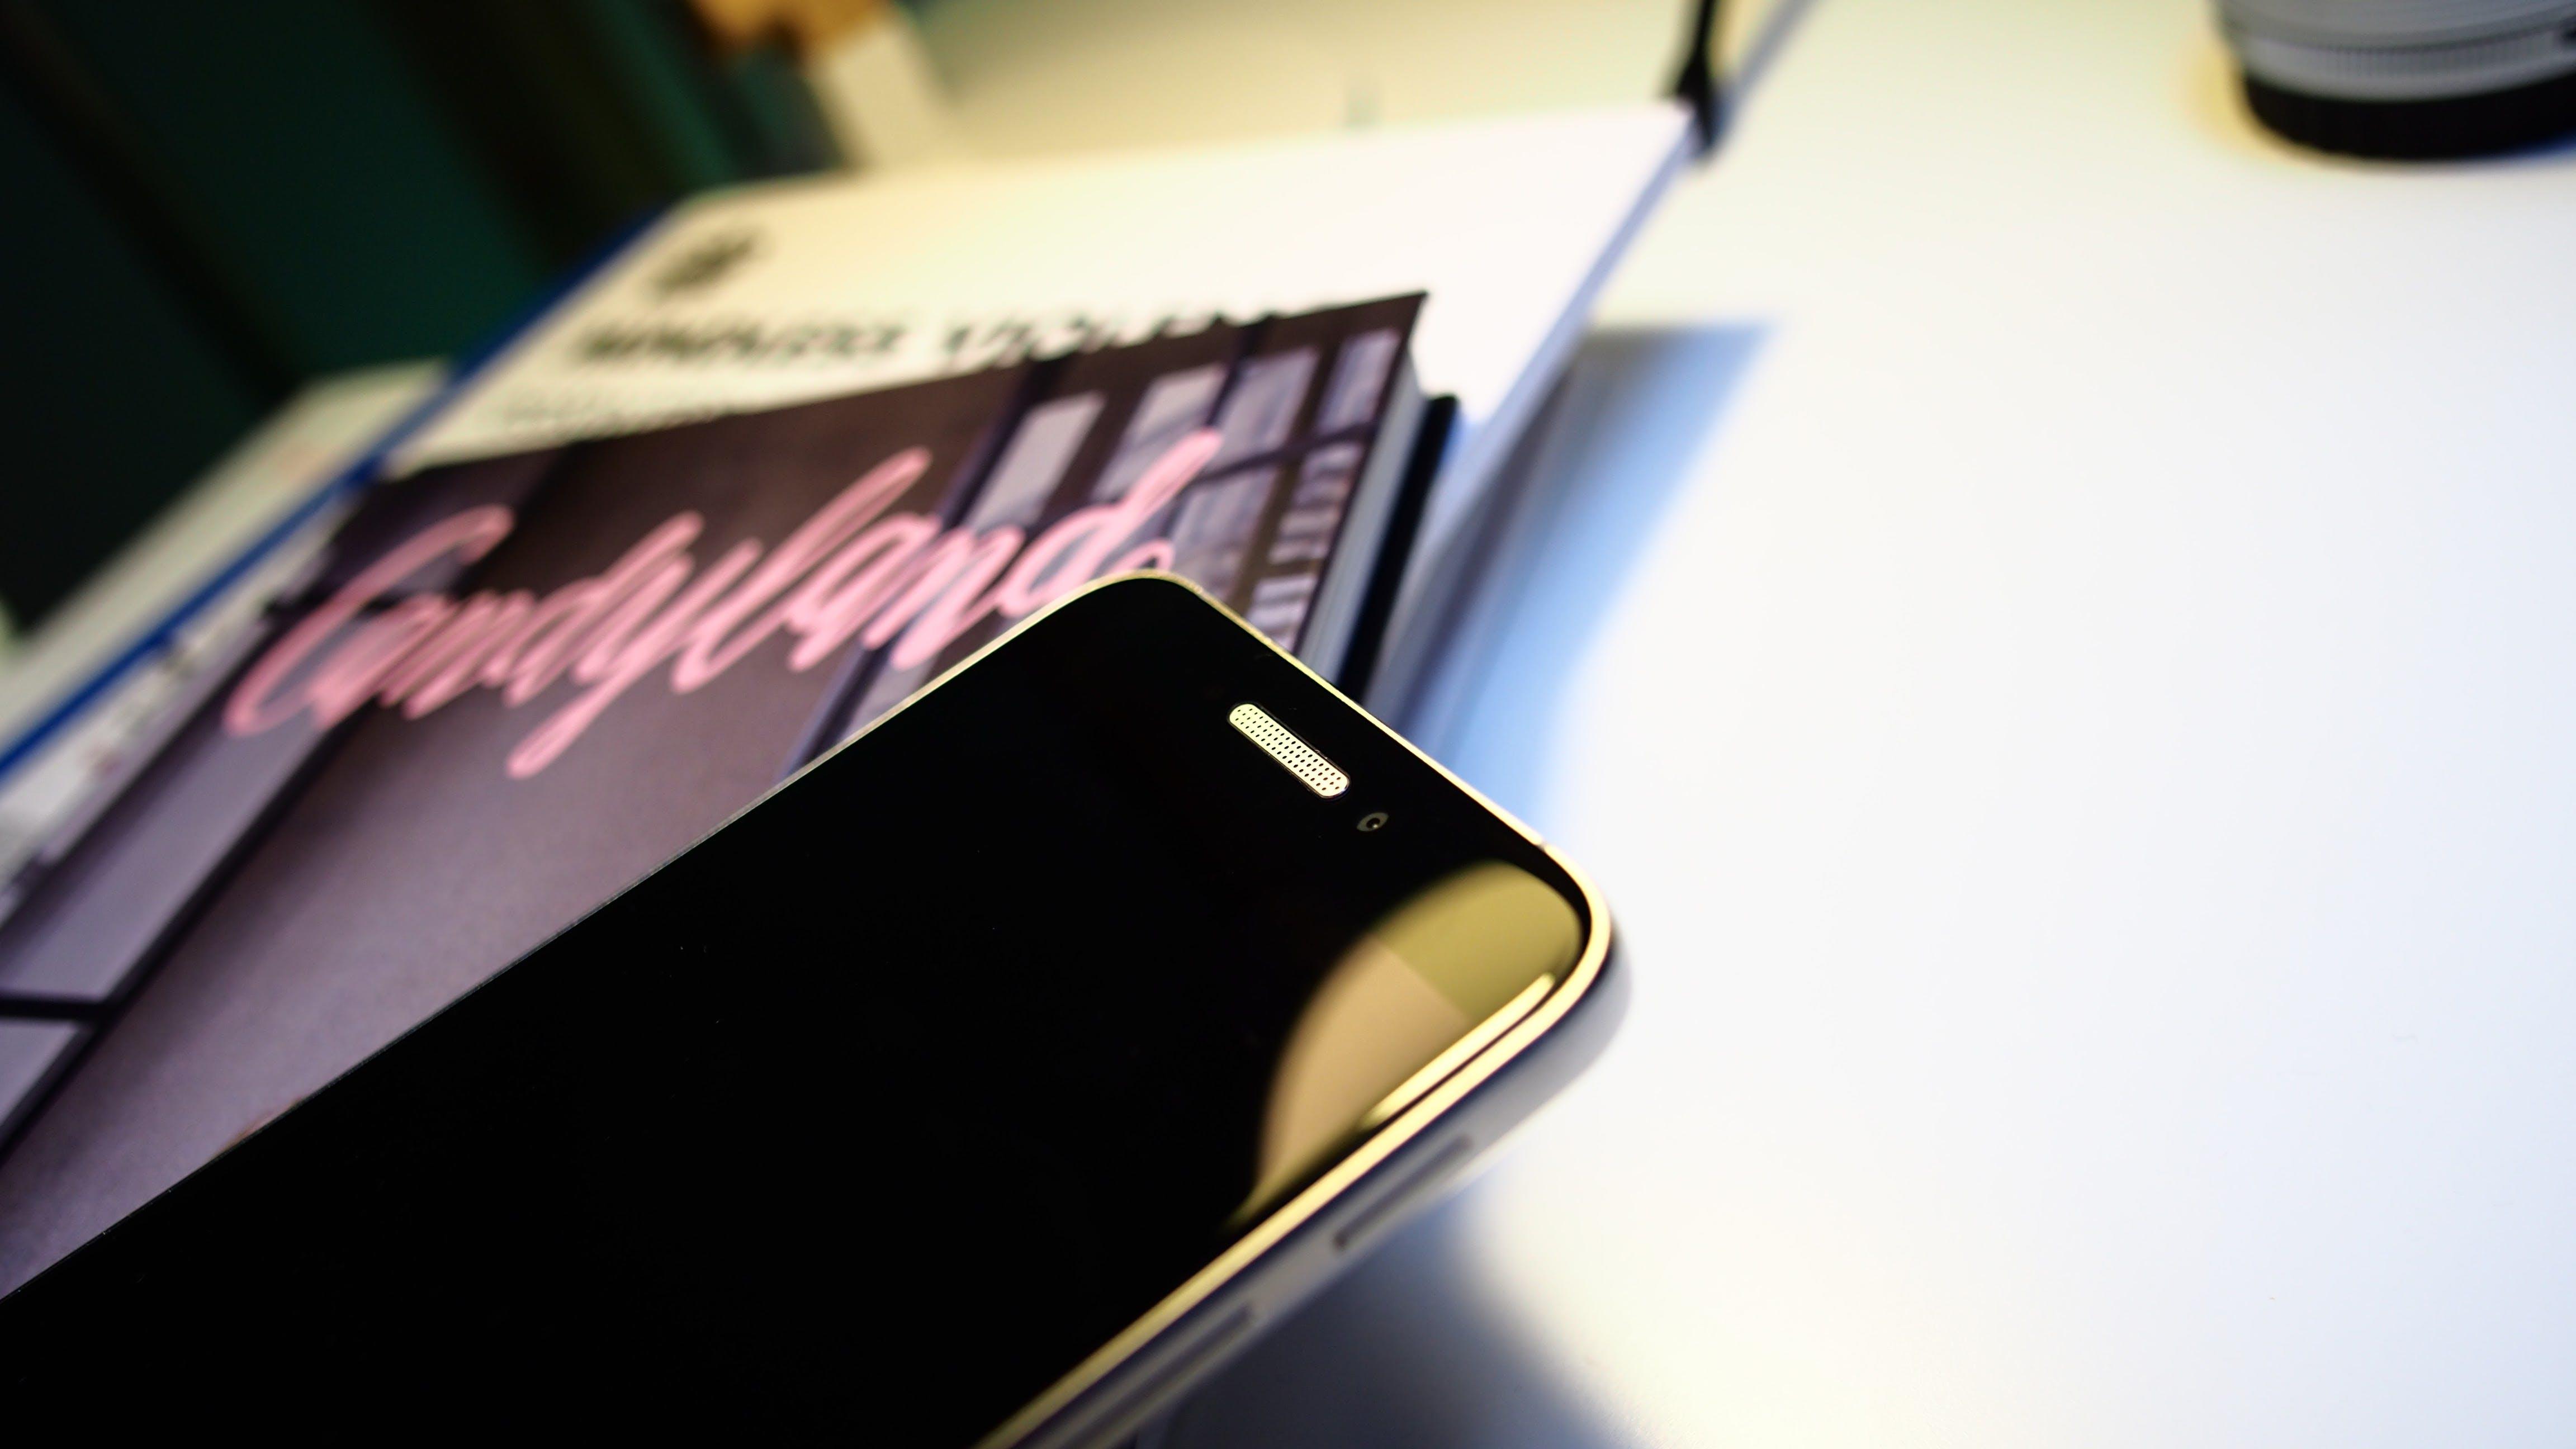 of smartphone